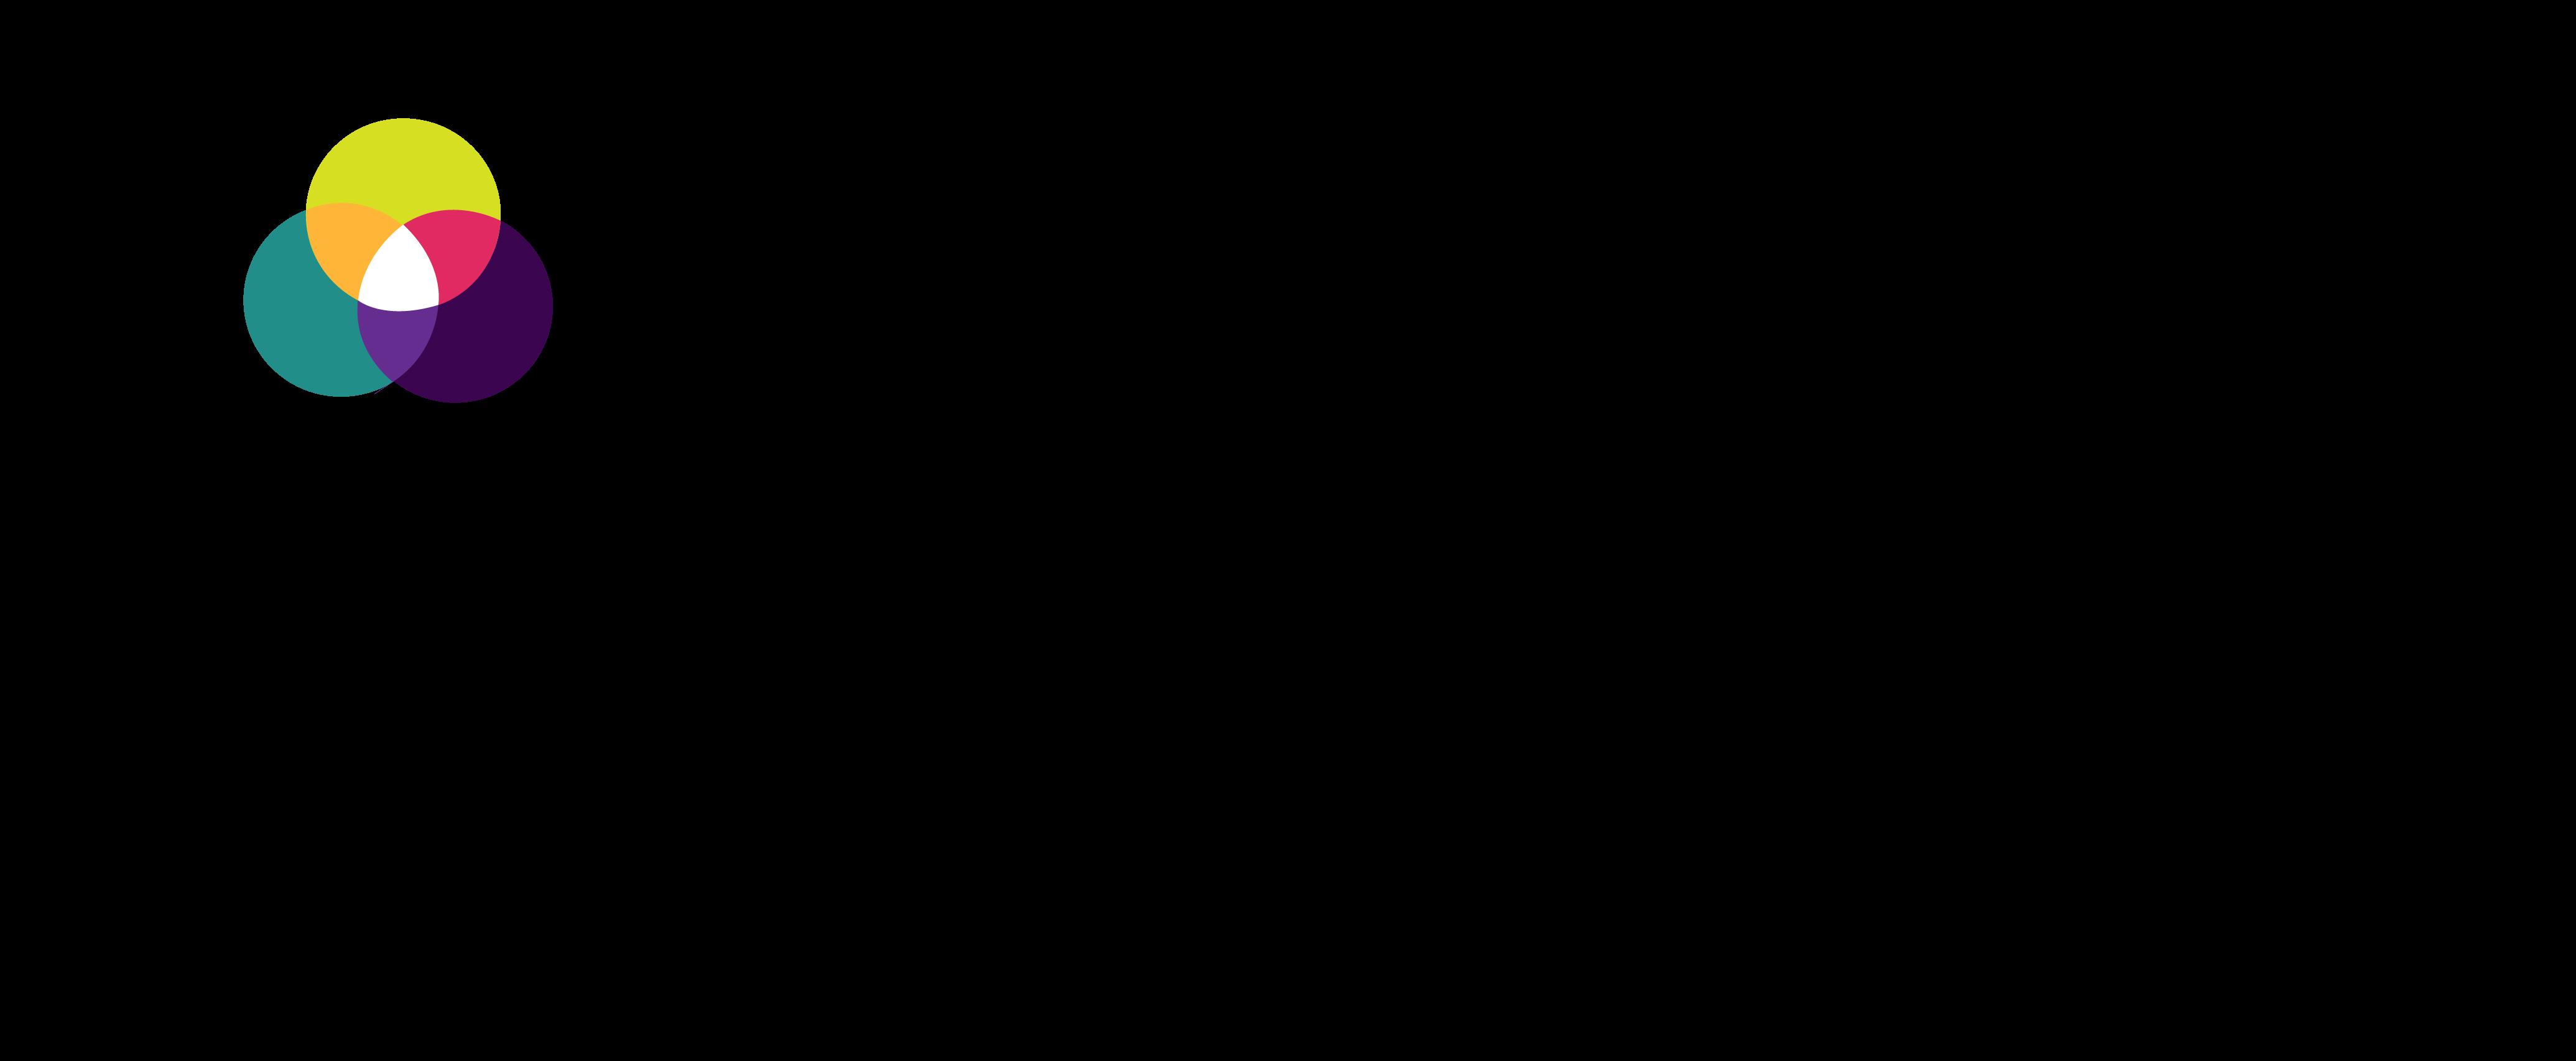 Ecommerce Tech Io logo